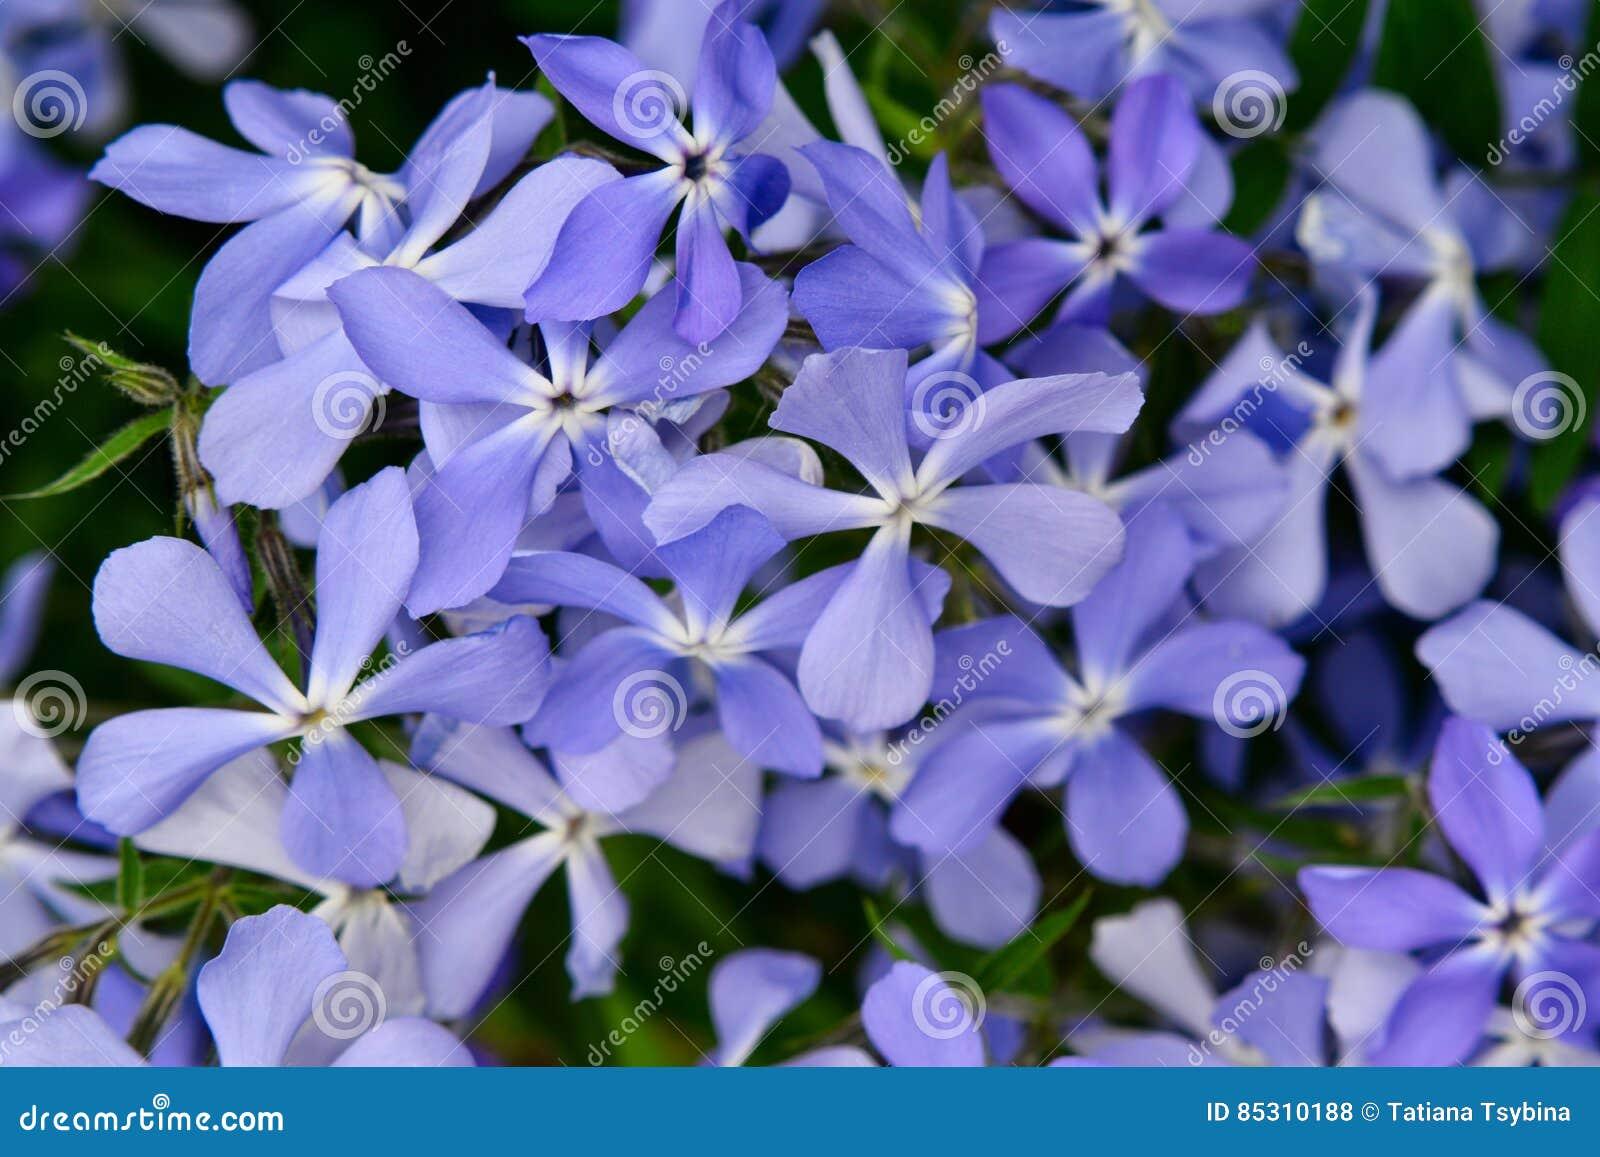 Many Small Flowering Light Purple Flowers Stock Photo Image Of